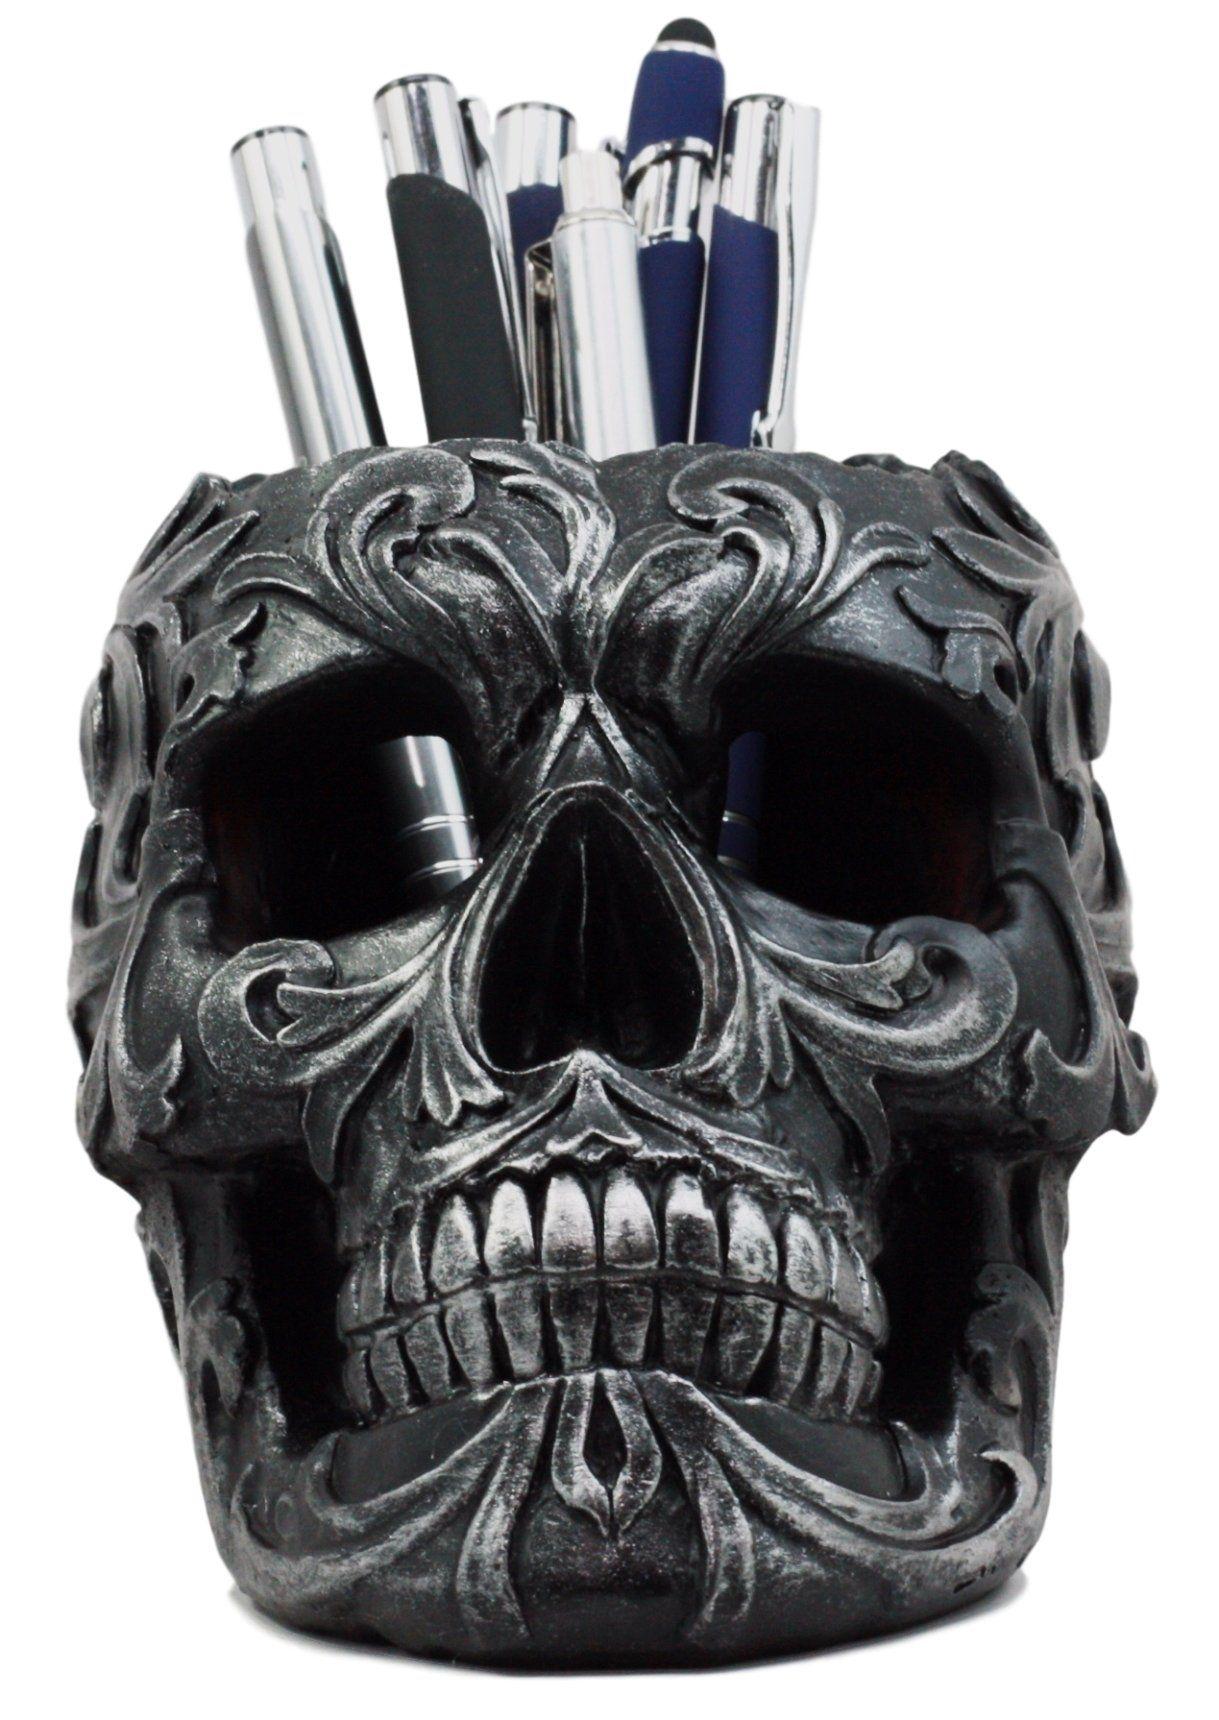 Ebros tribal tattoo floral skull pen holder figurine 575l